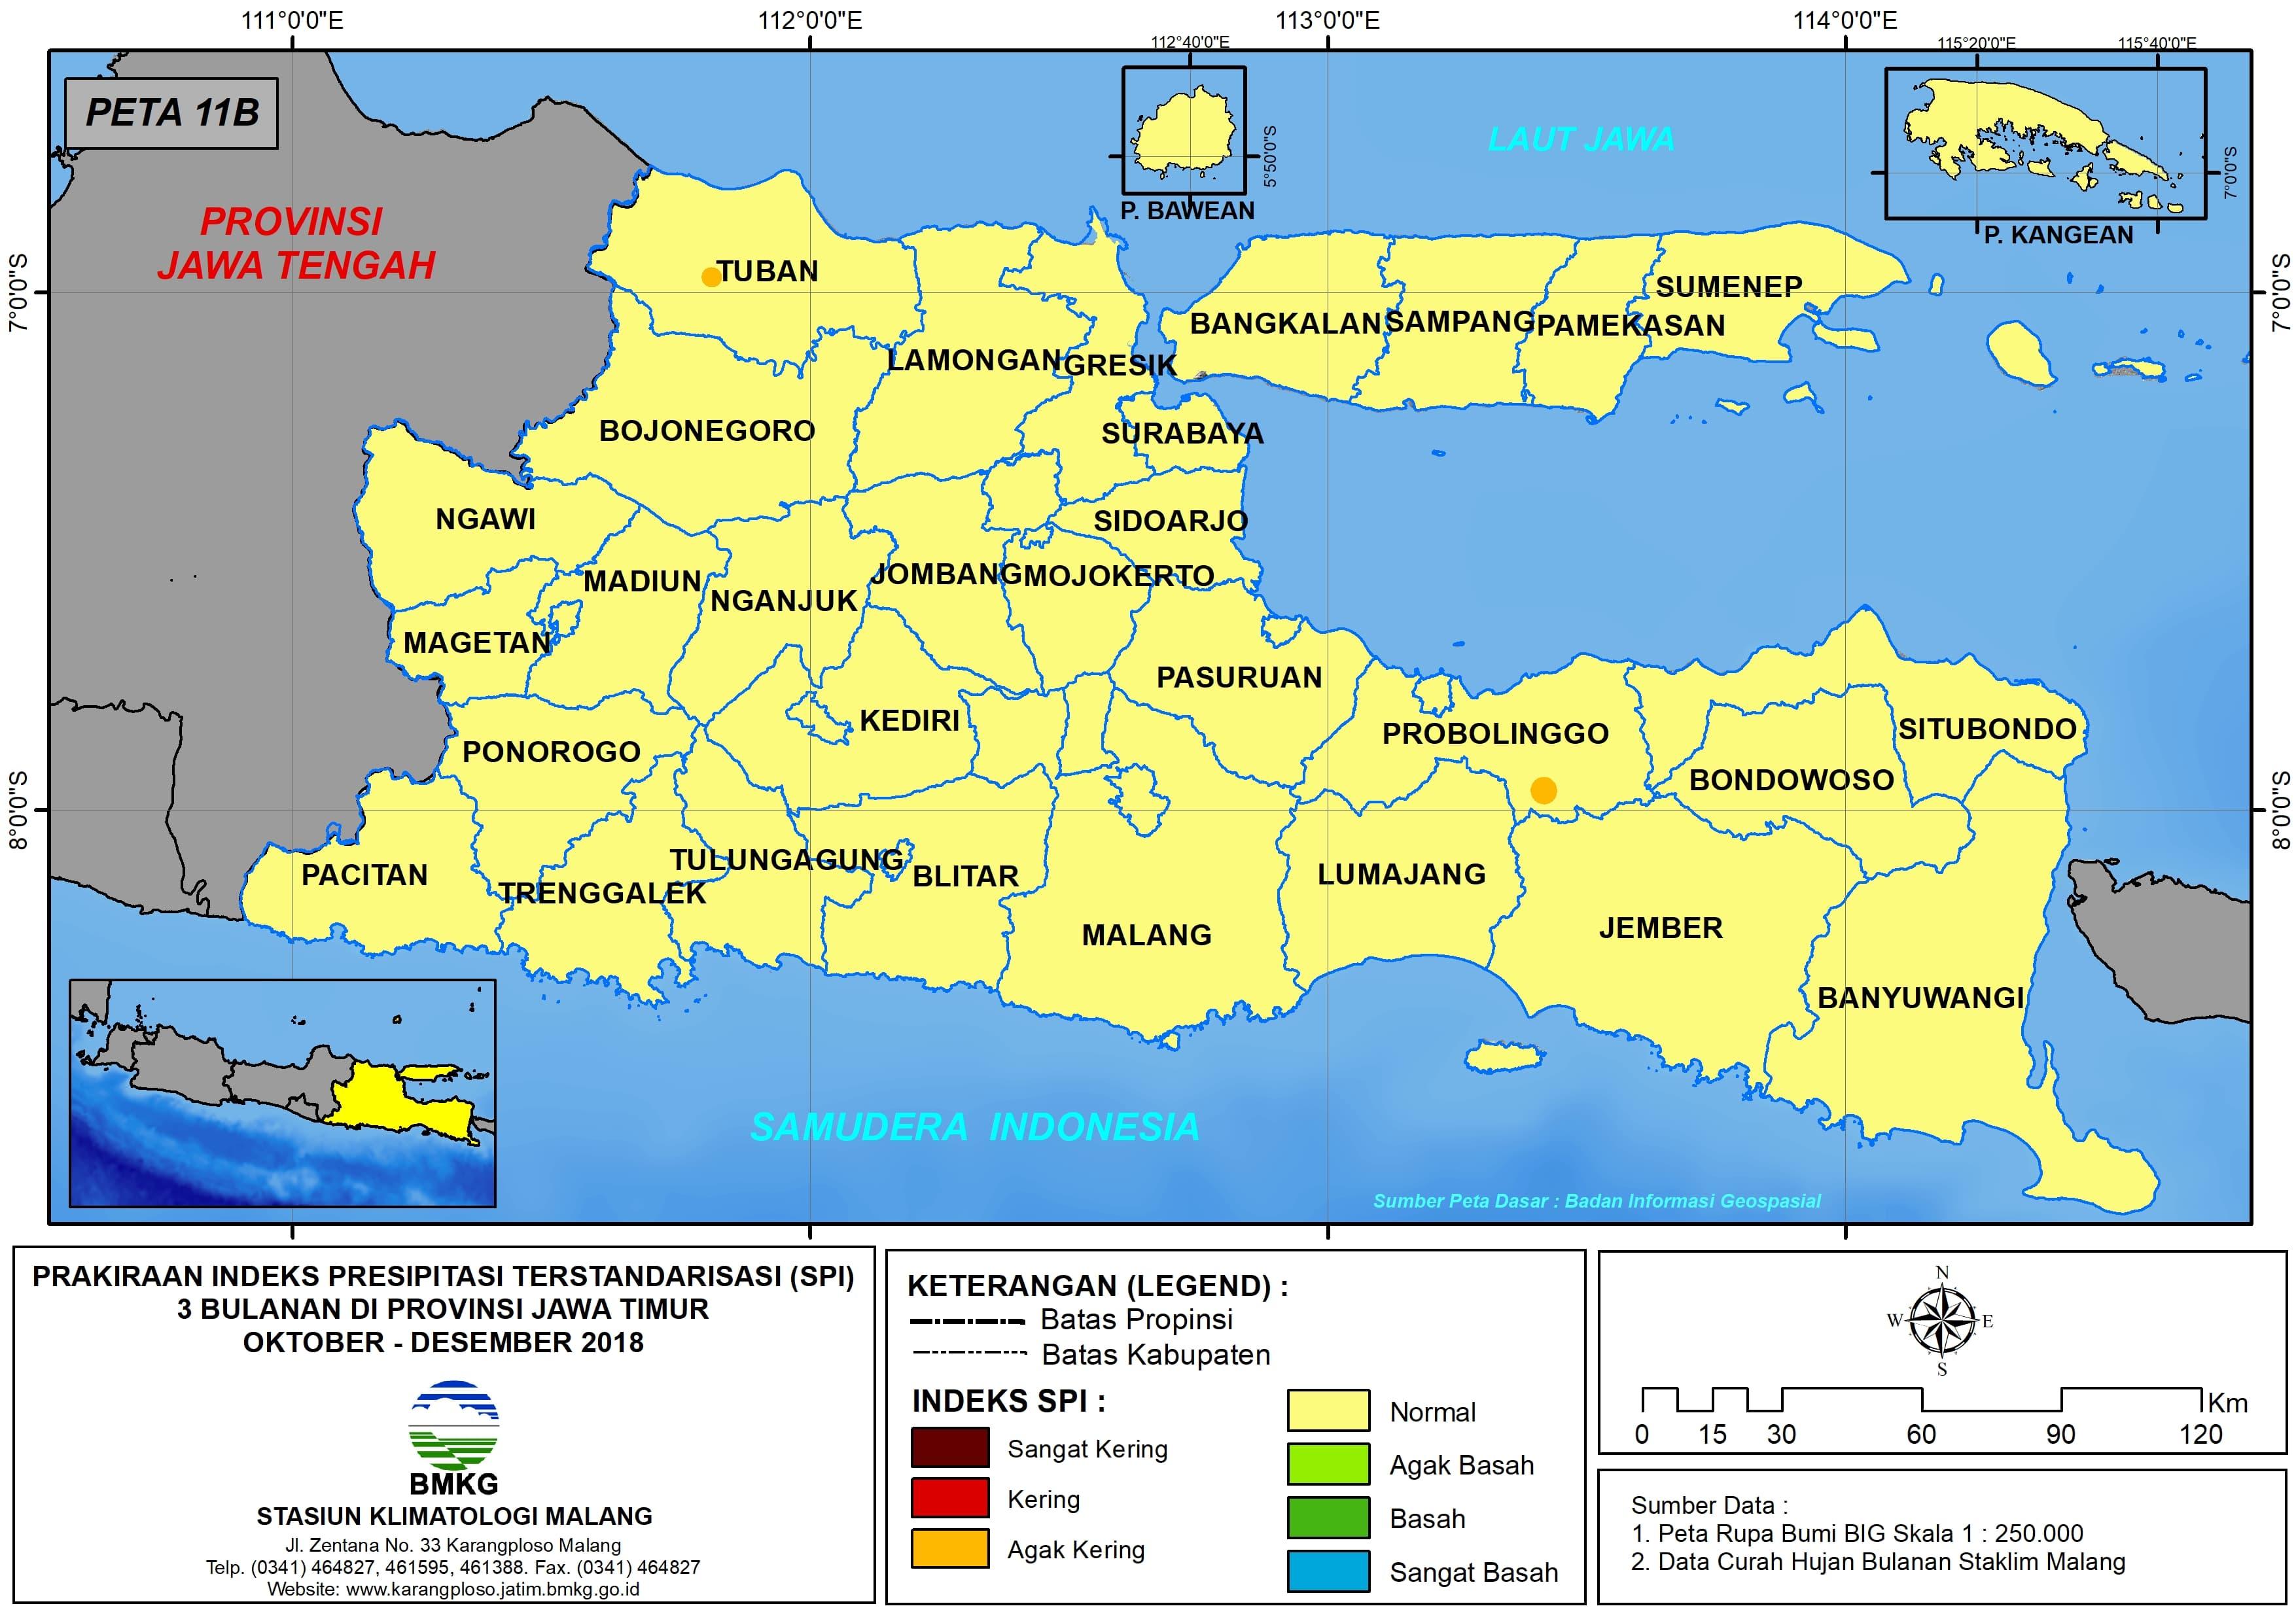 10 Prakiraan Indeks Presipitasi Terstandarisasi SPI 3 Bulanan di Provinsi Jawa Timur Bulan Oktober November Desember Tahun 2018 Update dari Analisis Bulan Oktober 2018